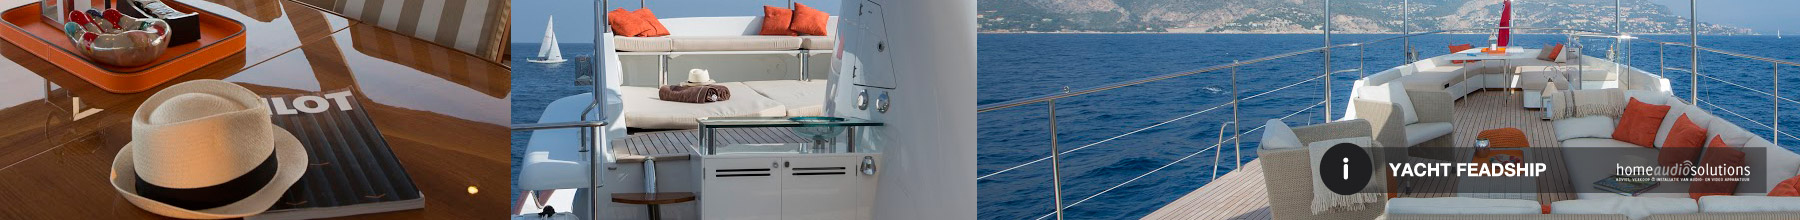 slide2_yacht1